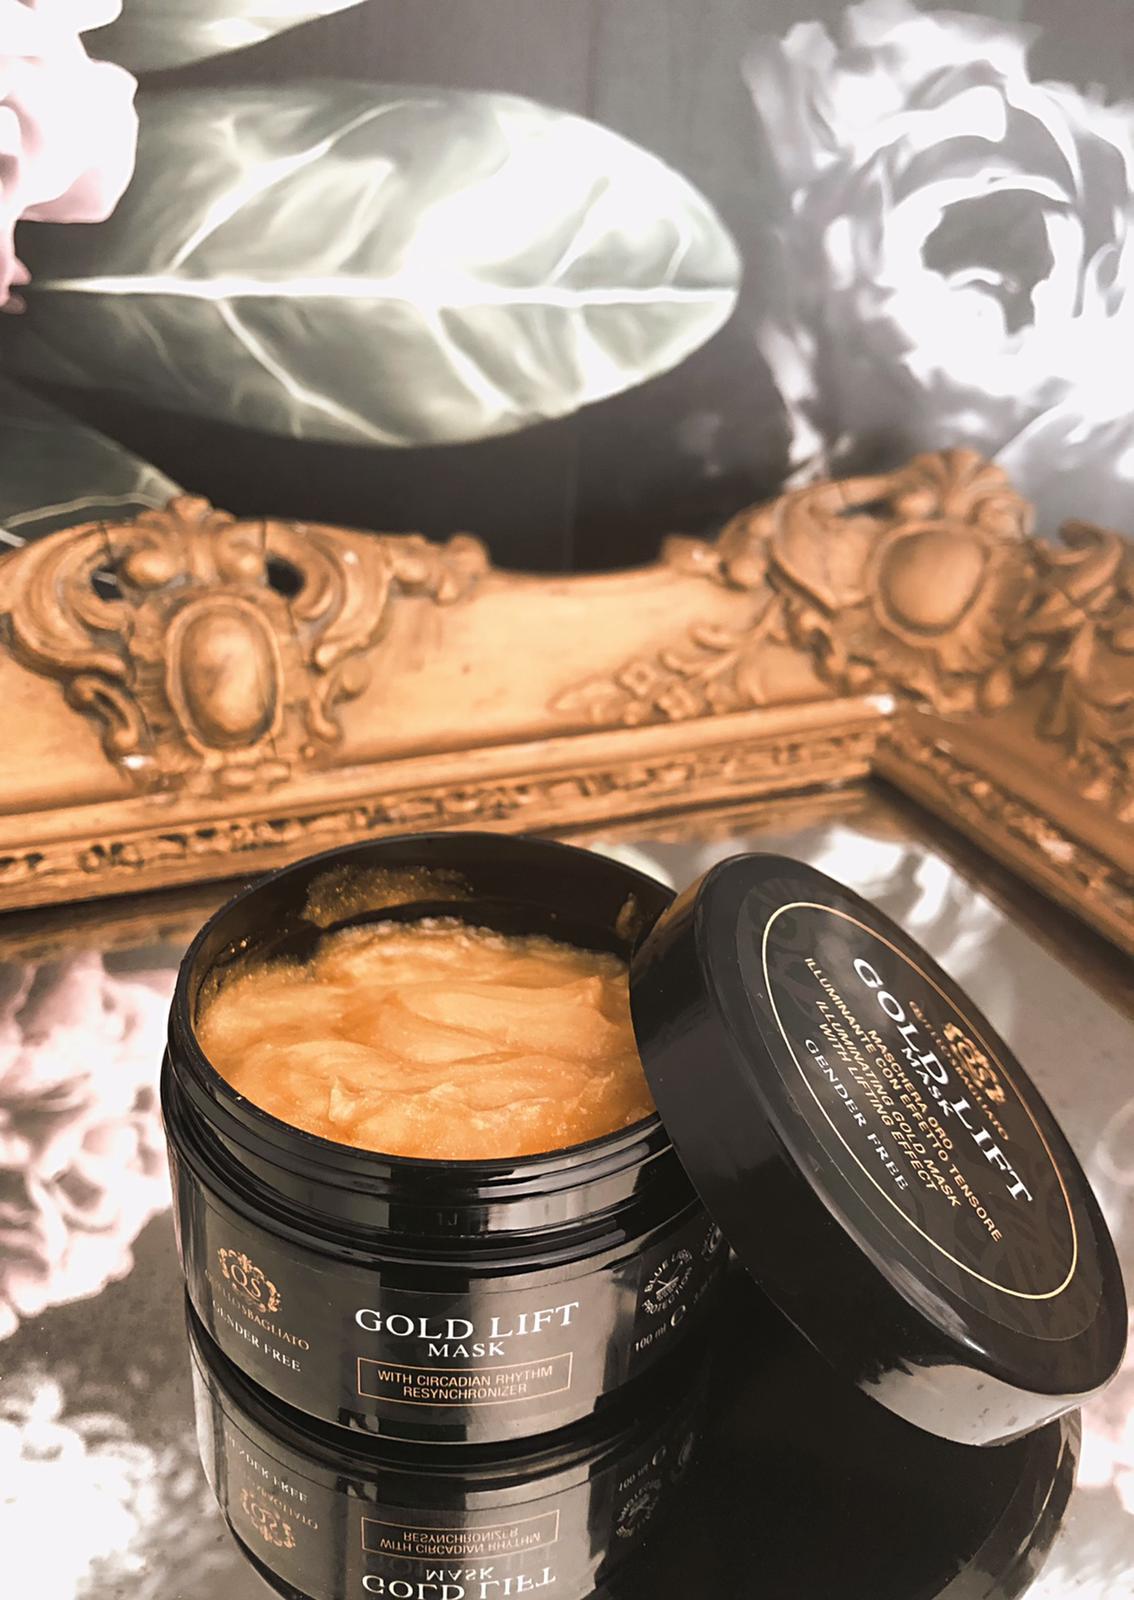 maschera oro illuminante con effetto tensore illuminante pelle perfetta